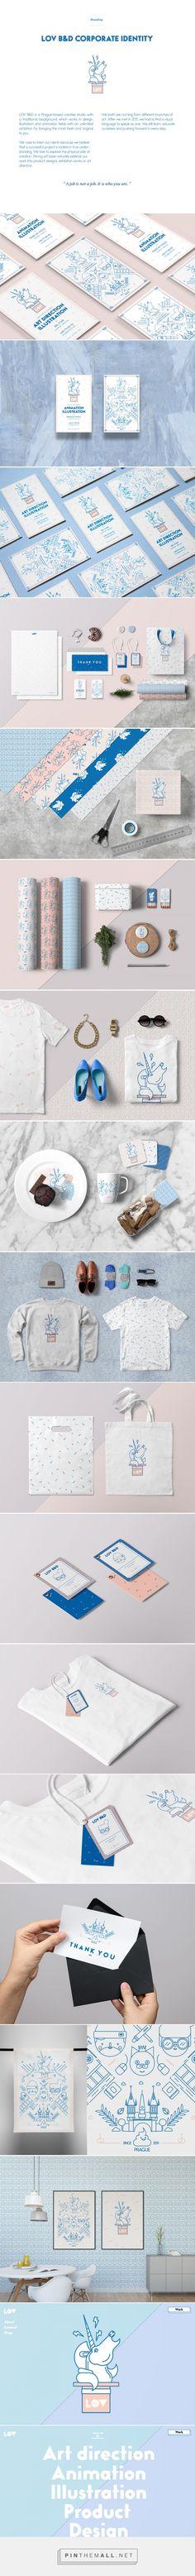 LOV B&D Creative Studio Personal Branding | Fivestar Branding Agency – Design and Branding Agency & Curated Inspiration Gallery